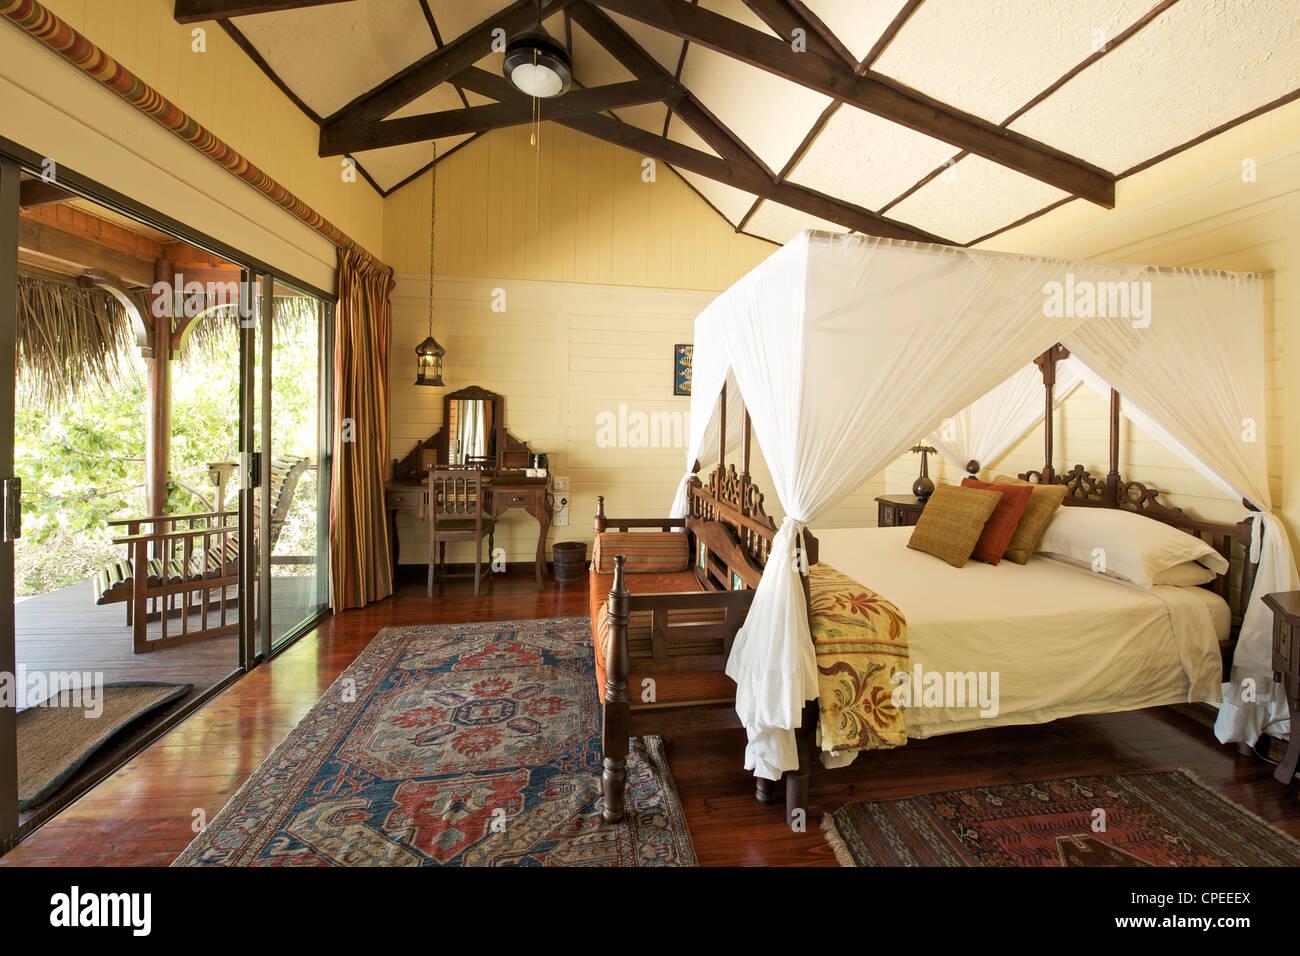 Matemo lodge in the Quirimbas archipelago in Mozambique. - Stock Image